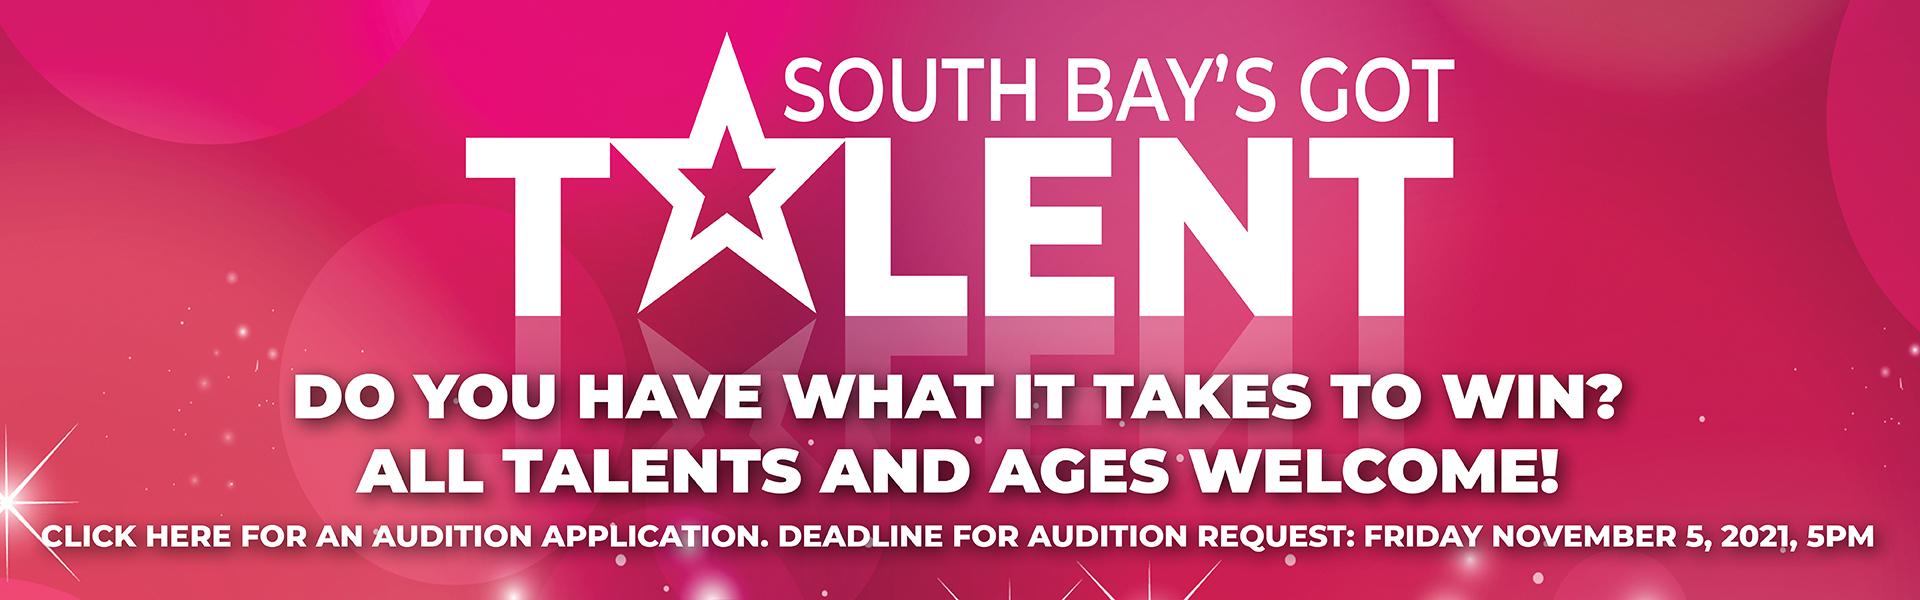 South Bay's Got Talent Audition Information